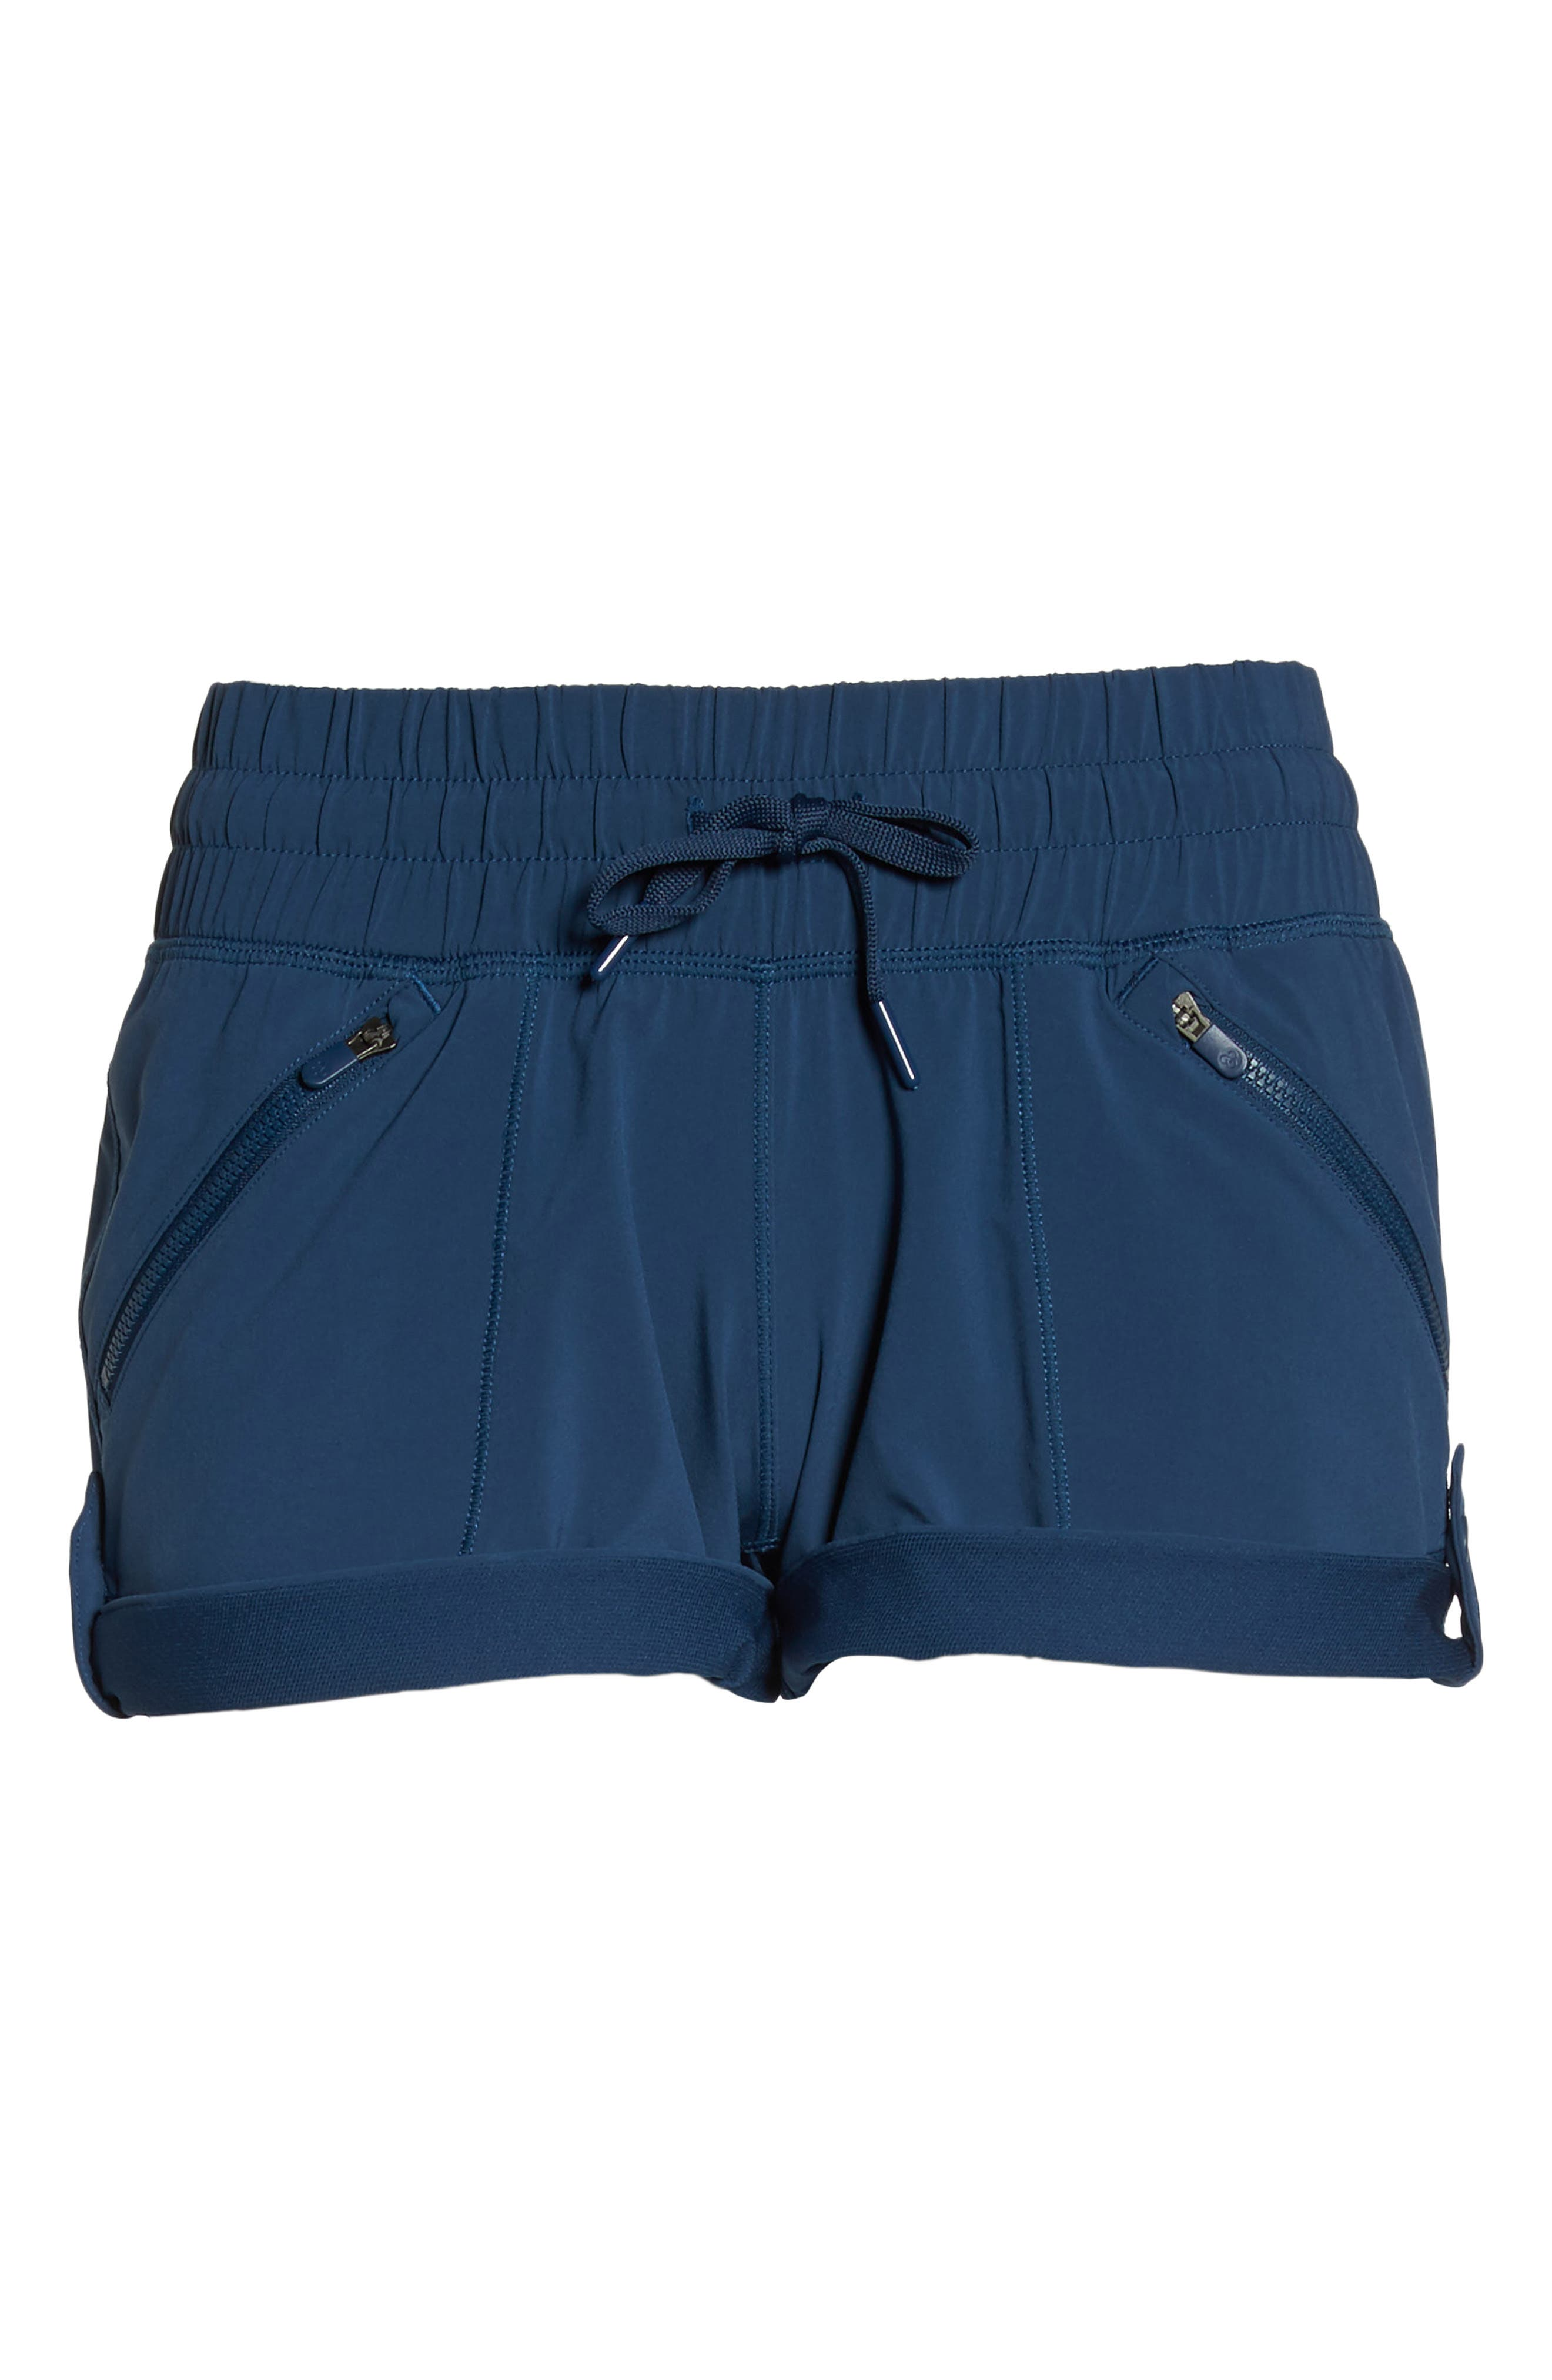 Switchback Shorts,                             Alternate thumbnail 49, color,